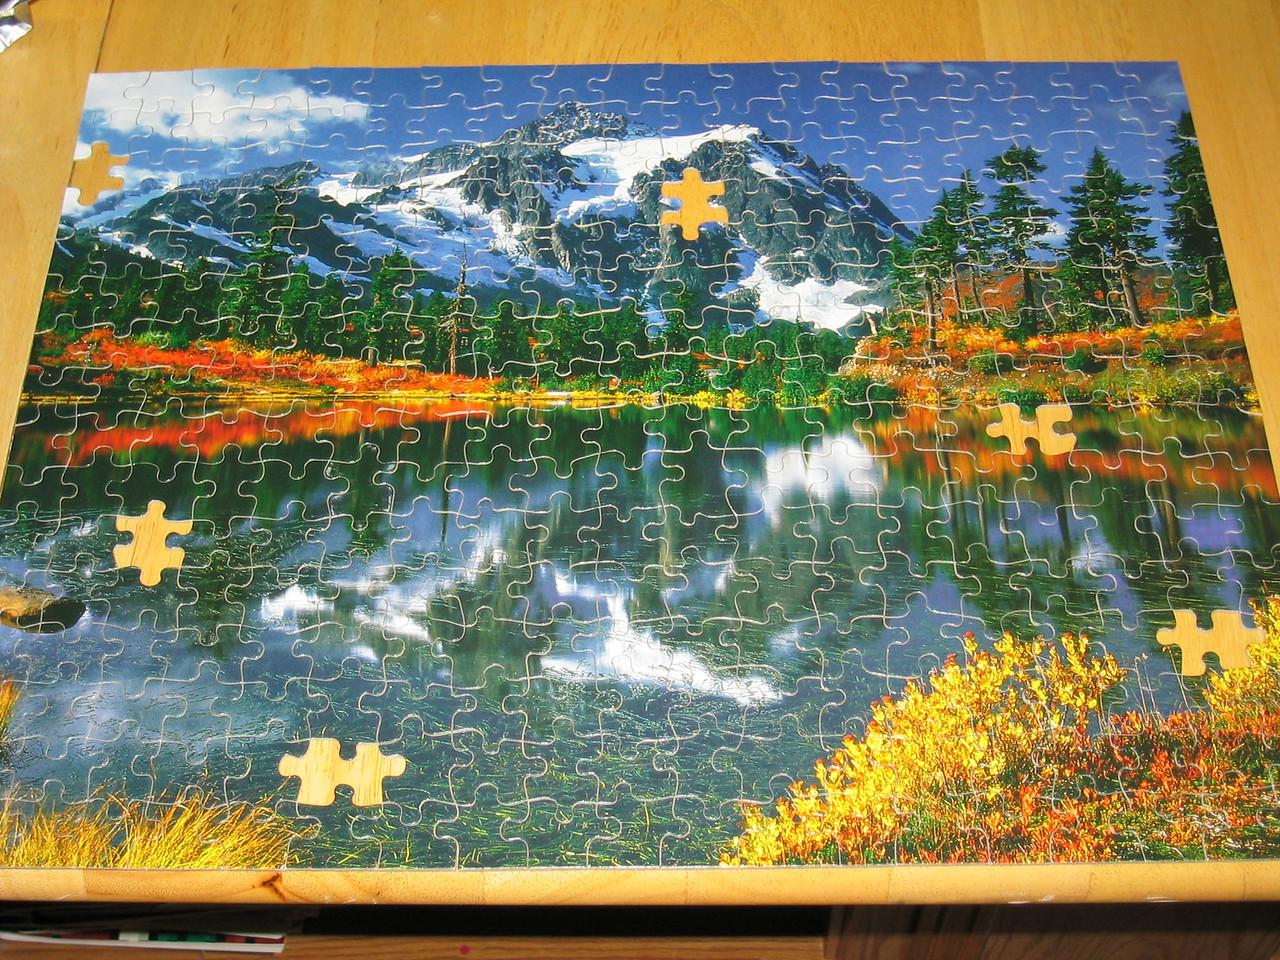 Albert & Lisa's community group - Puzzle fitting success minus half a dozen pieces missing by half a dozen people in about half a dozen 10 minutes, Tuesday 2003 07 22